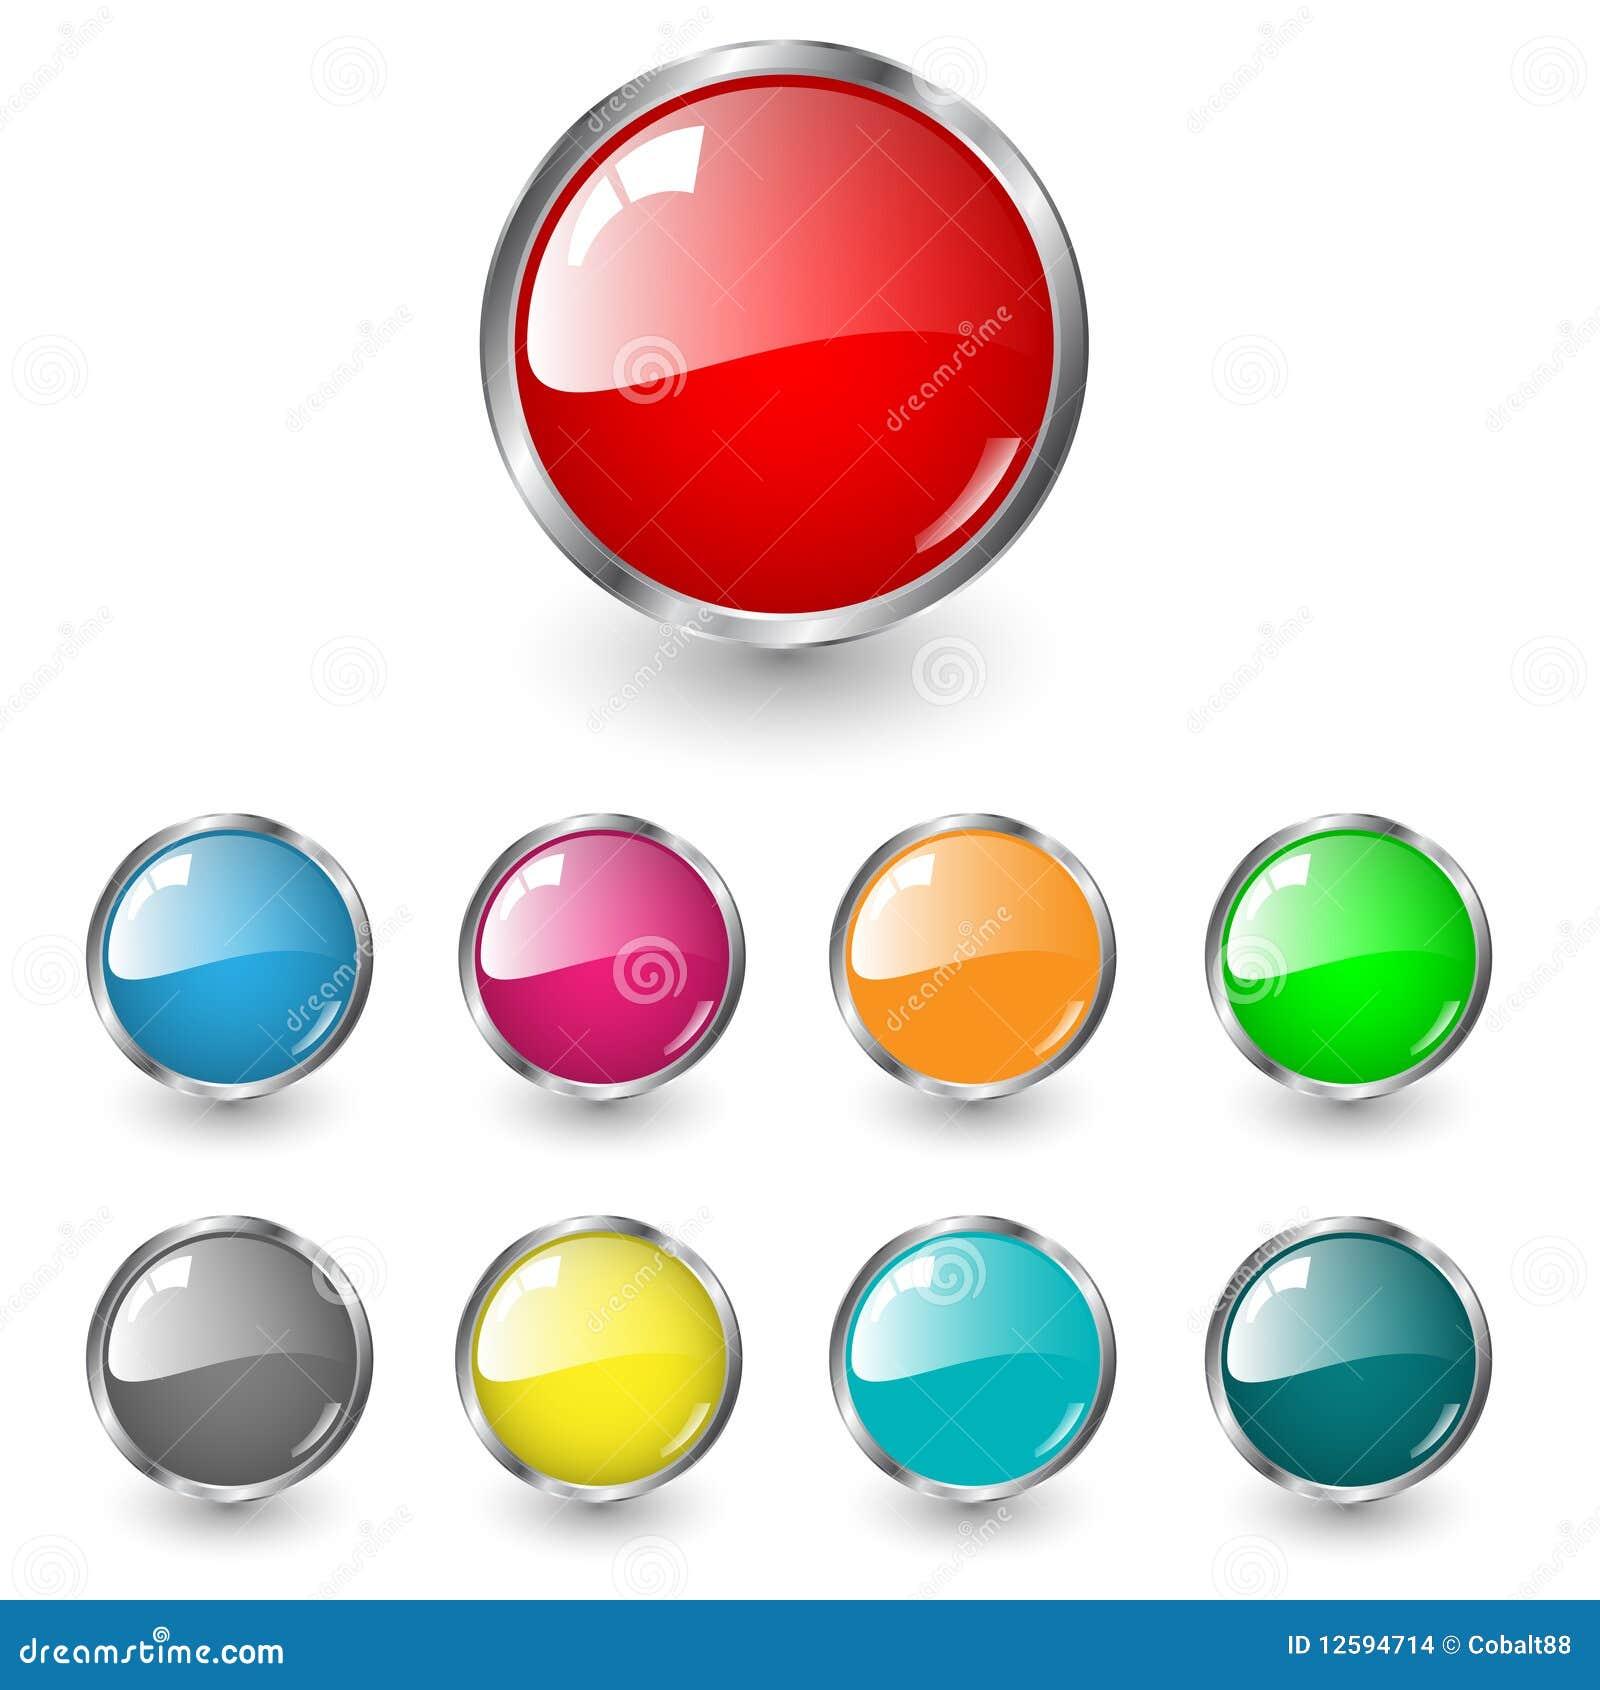 how to set ptt button rainbow 6